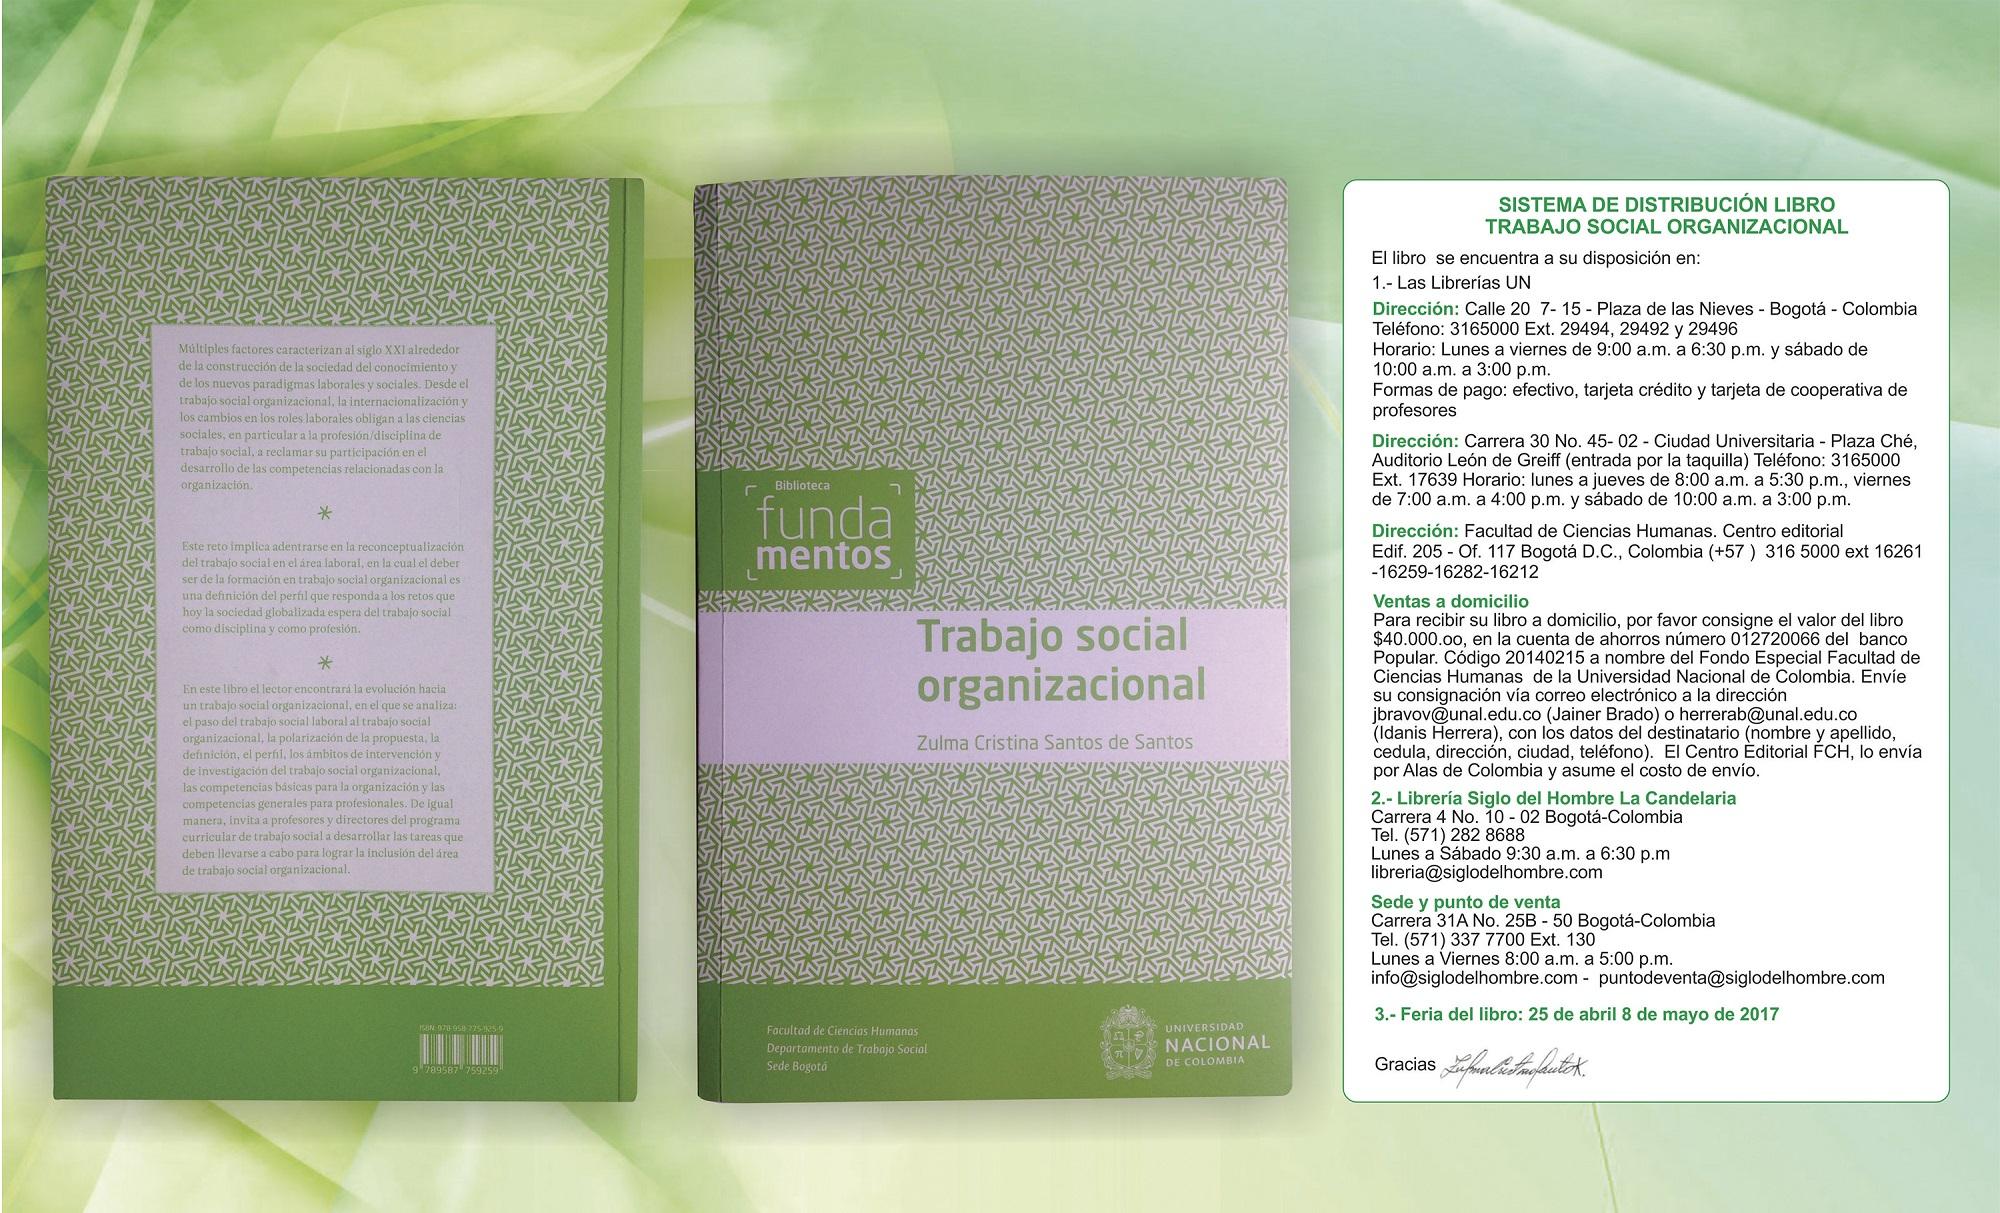 imagen libro trabajo social organizacional